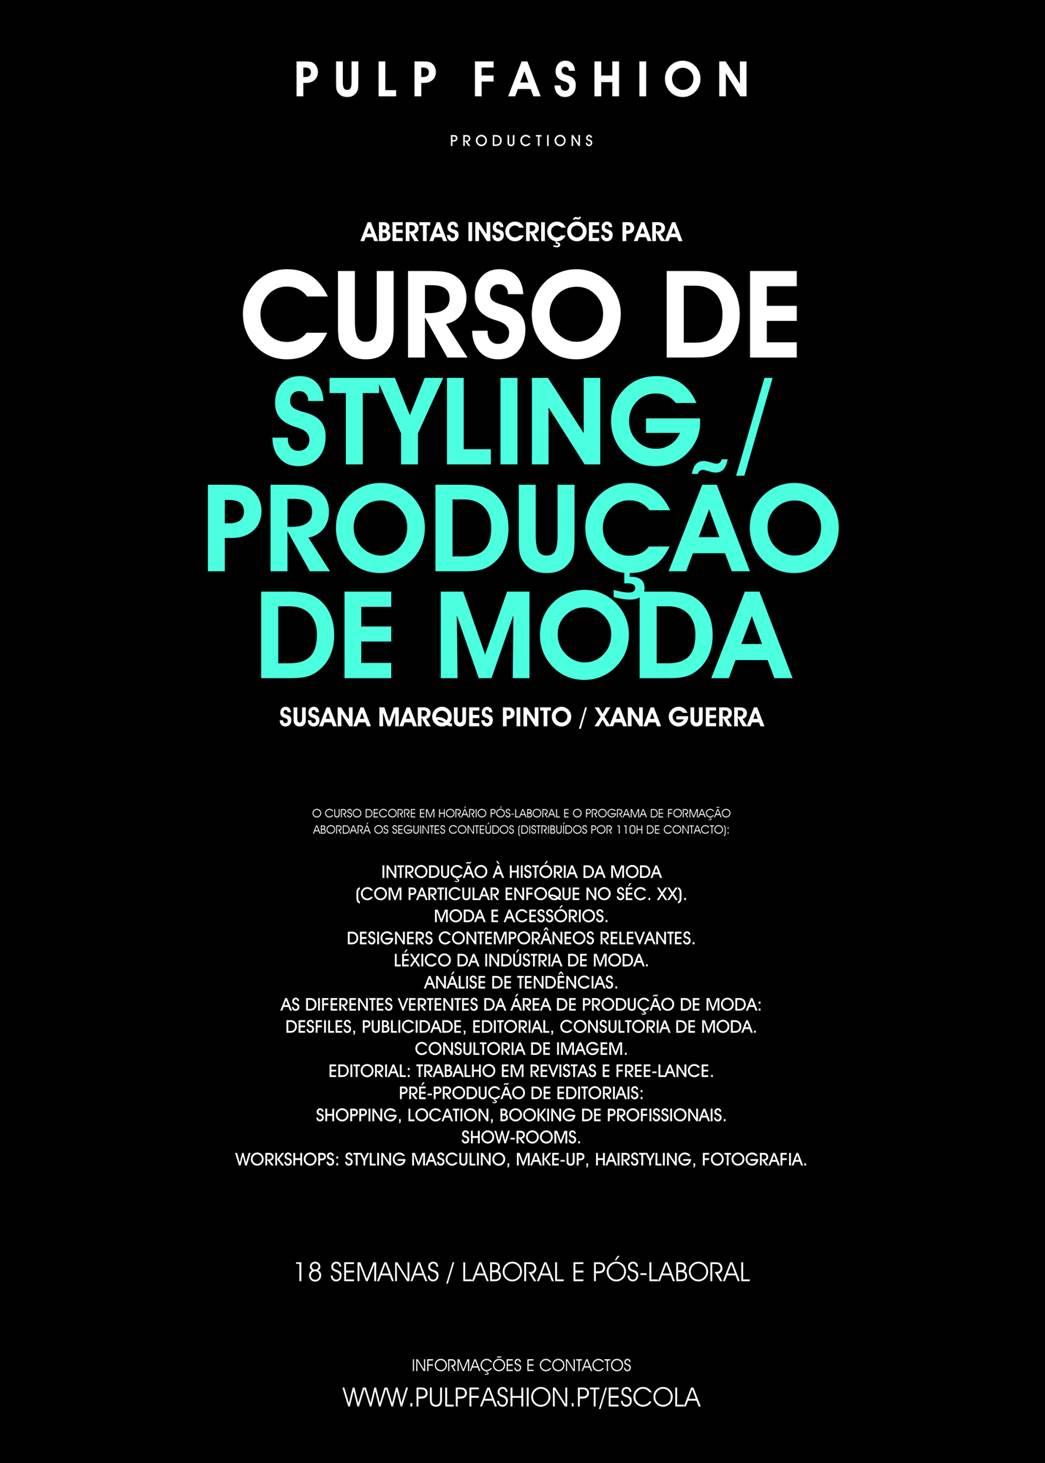 Pulp Fashion abre novo curso de styling